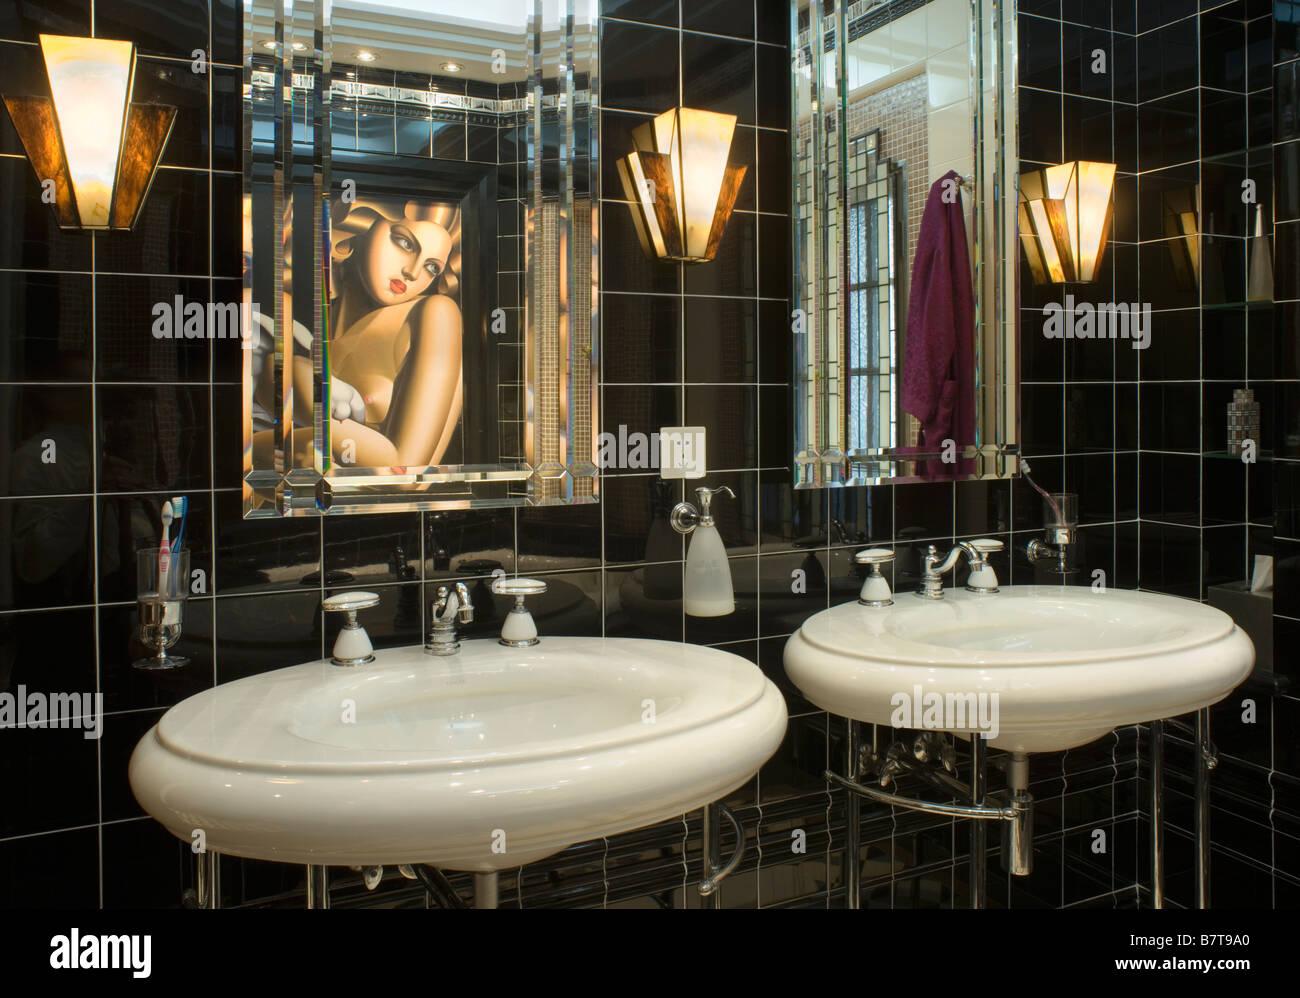 1930 Bathroom Design Art Deco Bathroom Stock Photos Amp Art Deco Bathroom Stock